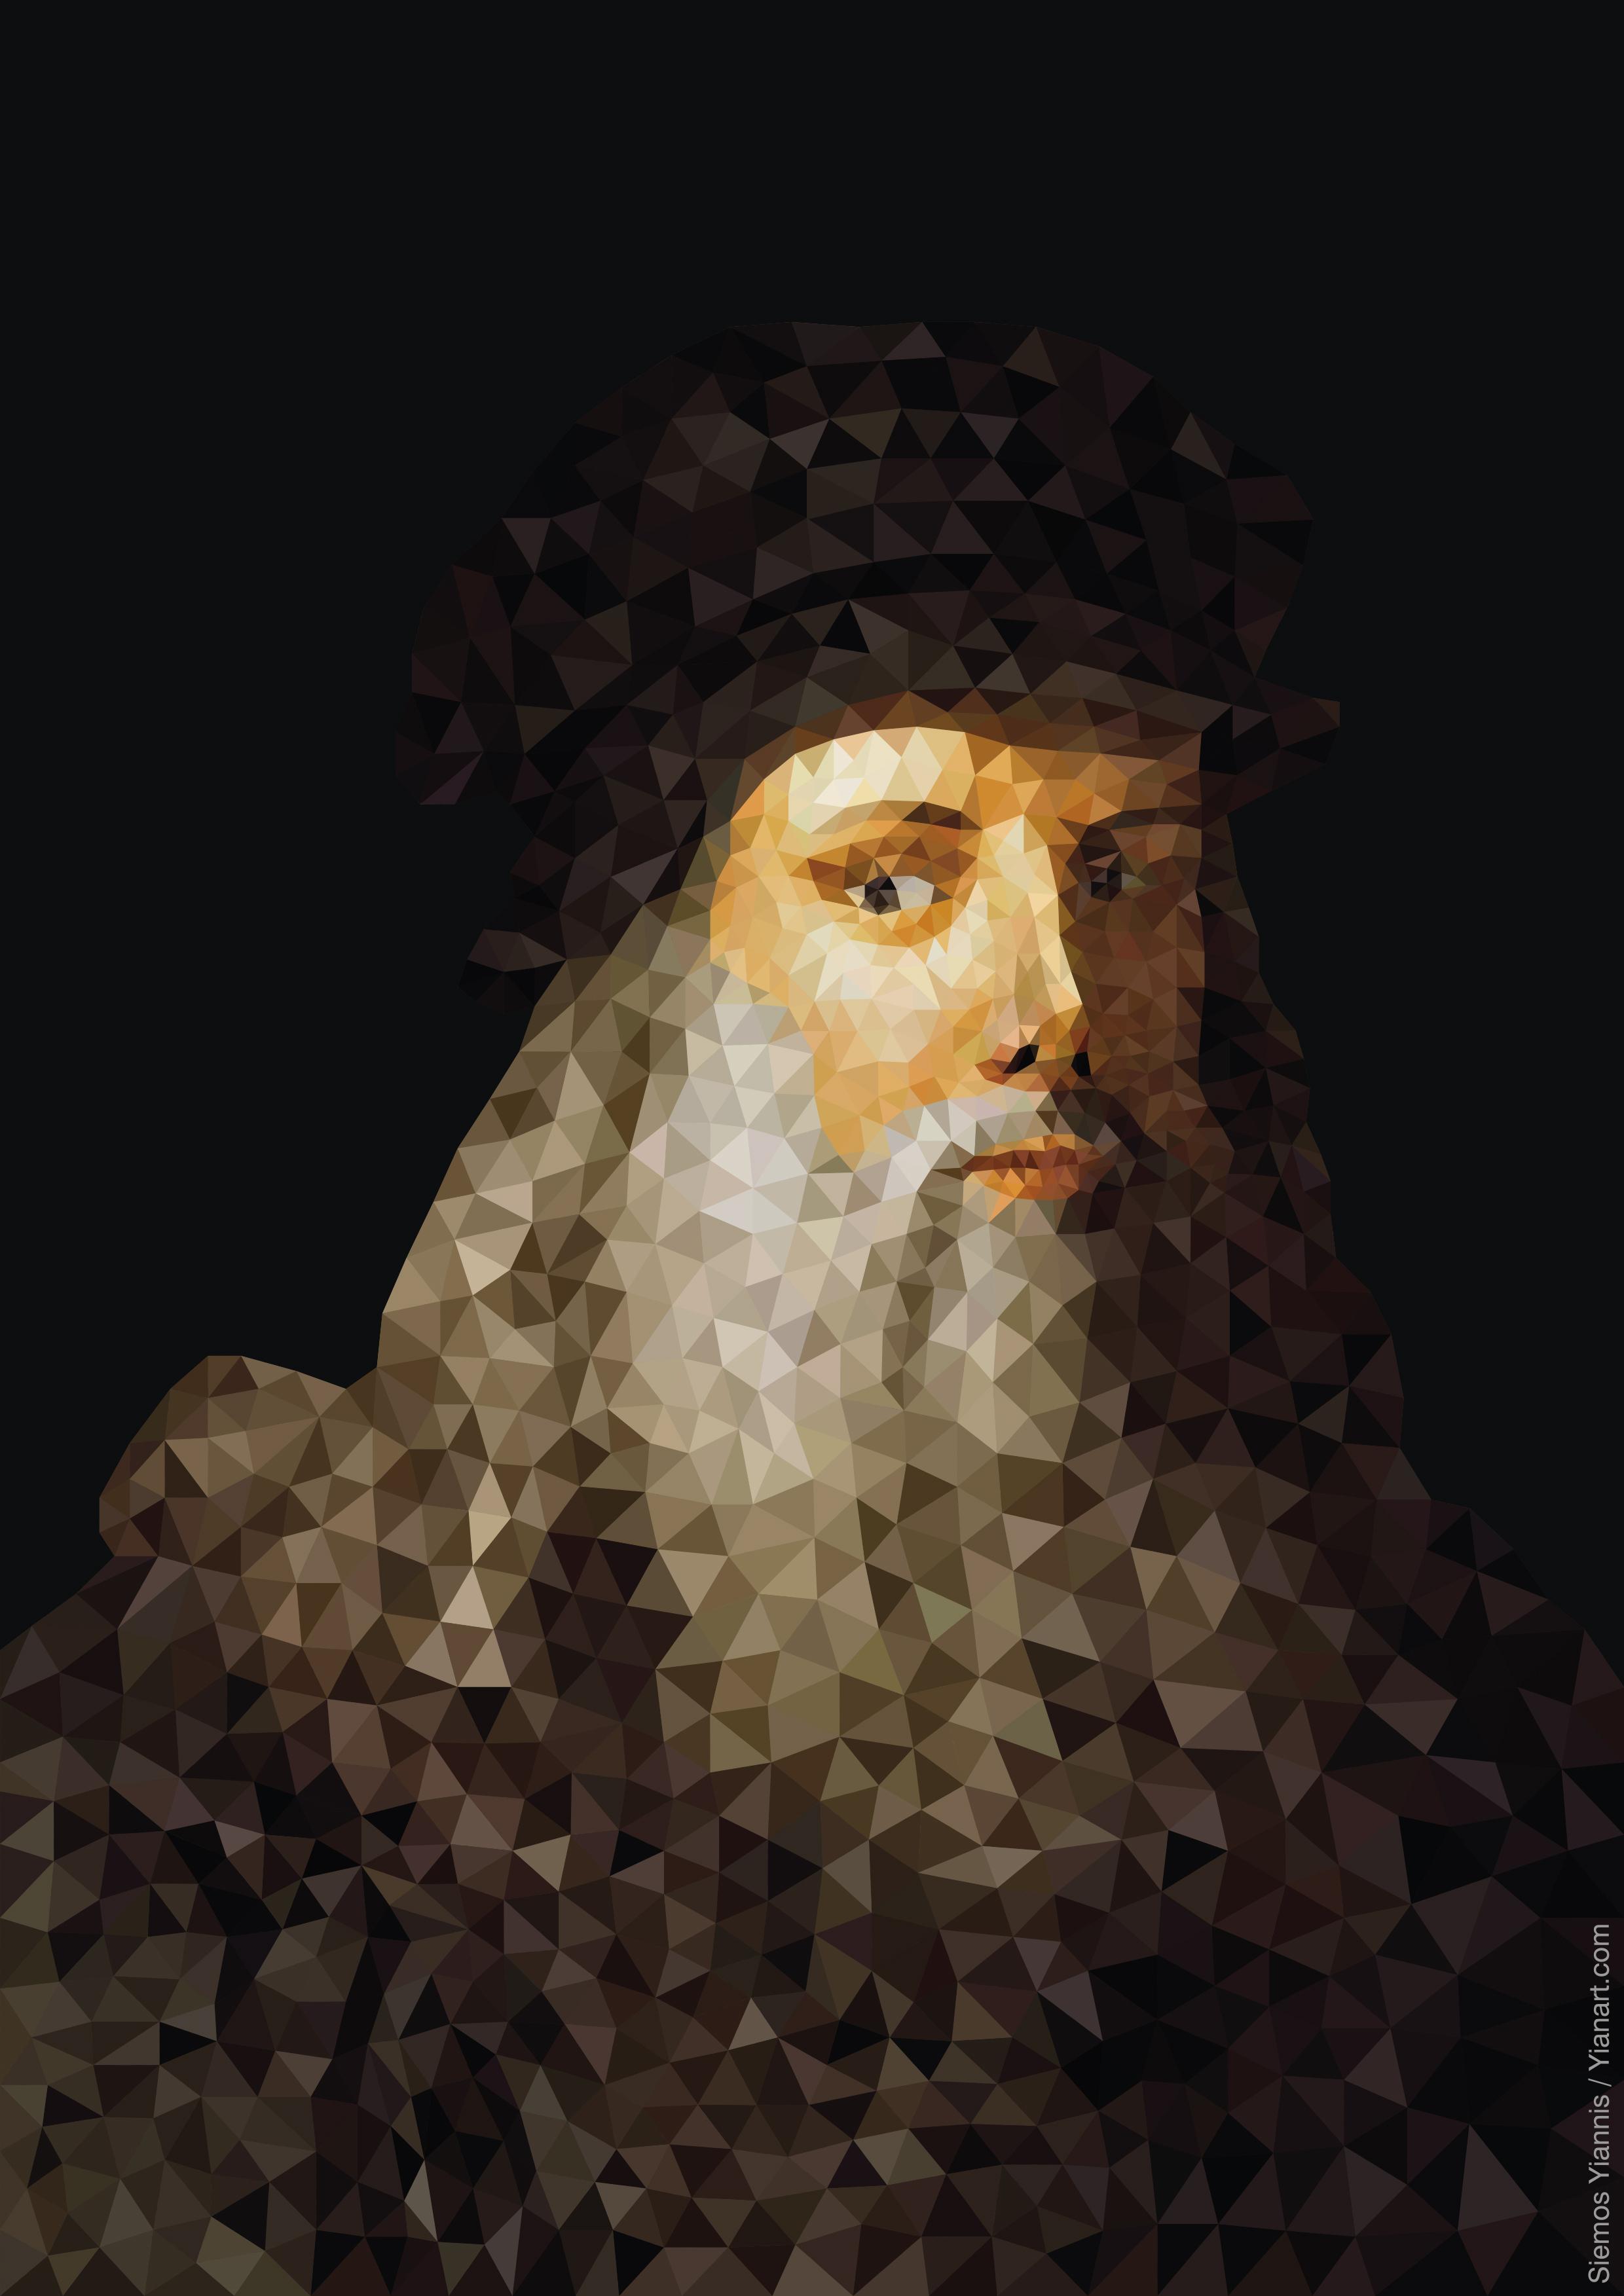 Leonardo da Vinci_Yianart.com